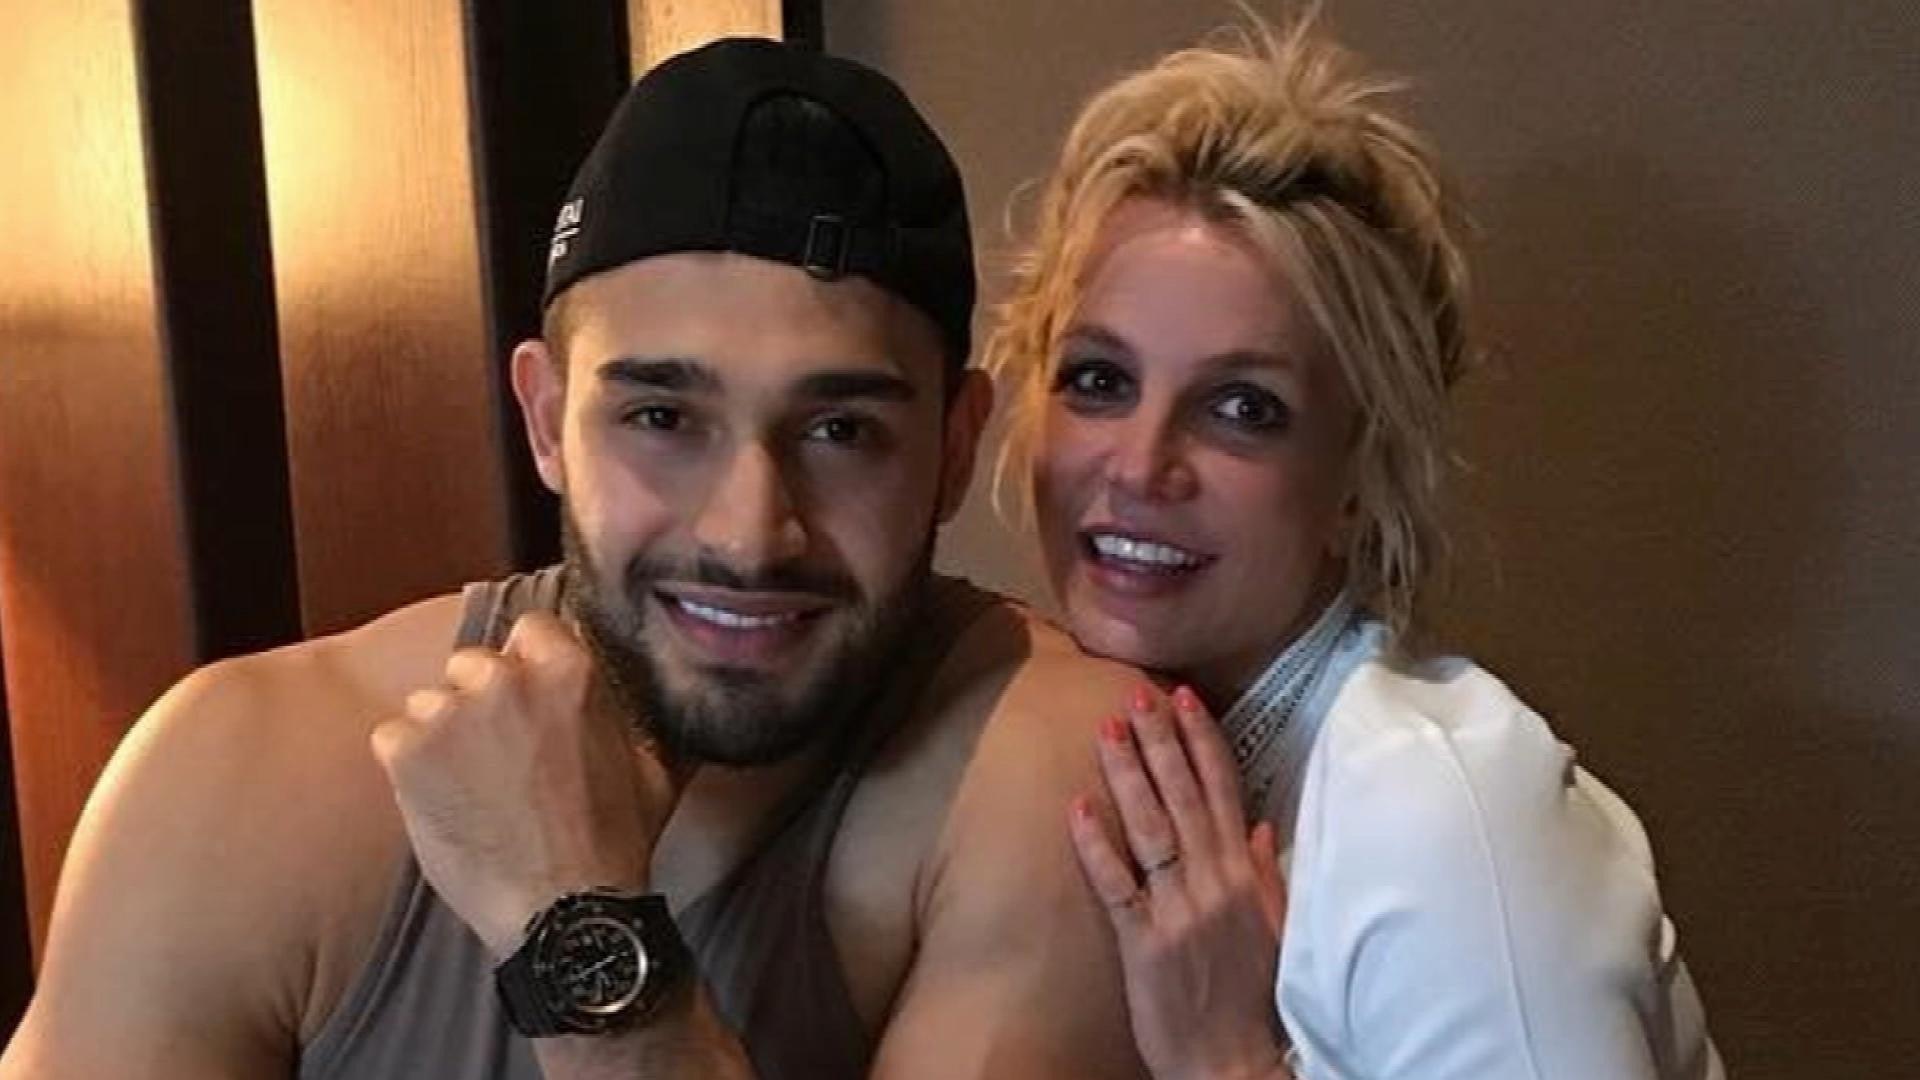 Britney Spears Actor Boyfriend Sam Asghari Reveals Plans To Open Soccer Academy Exclusive Entertainment Tonight